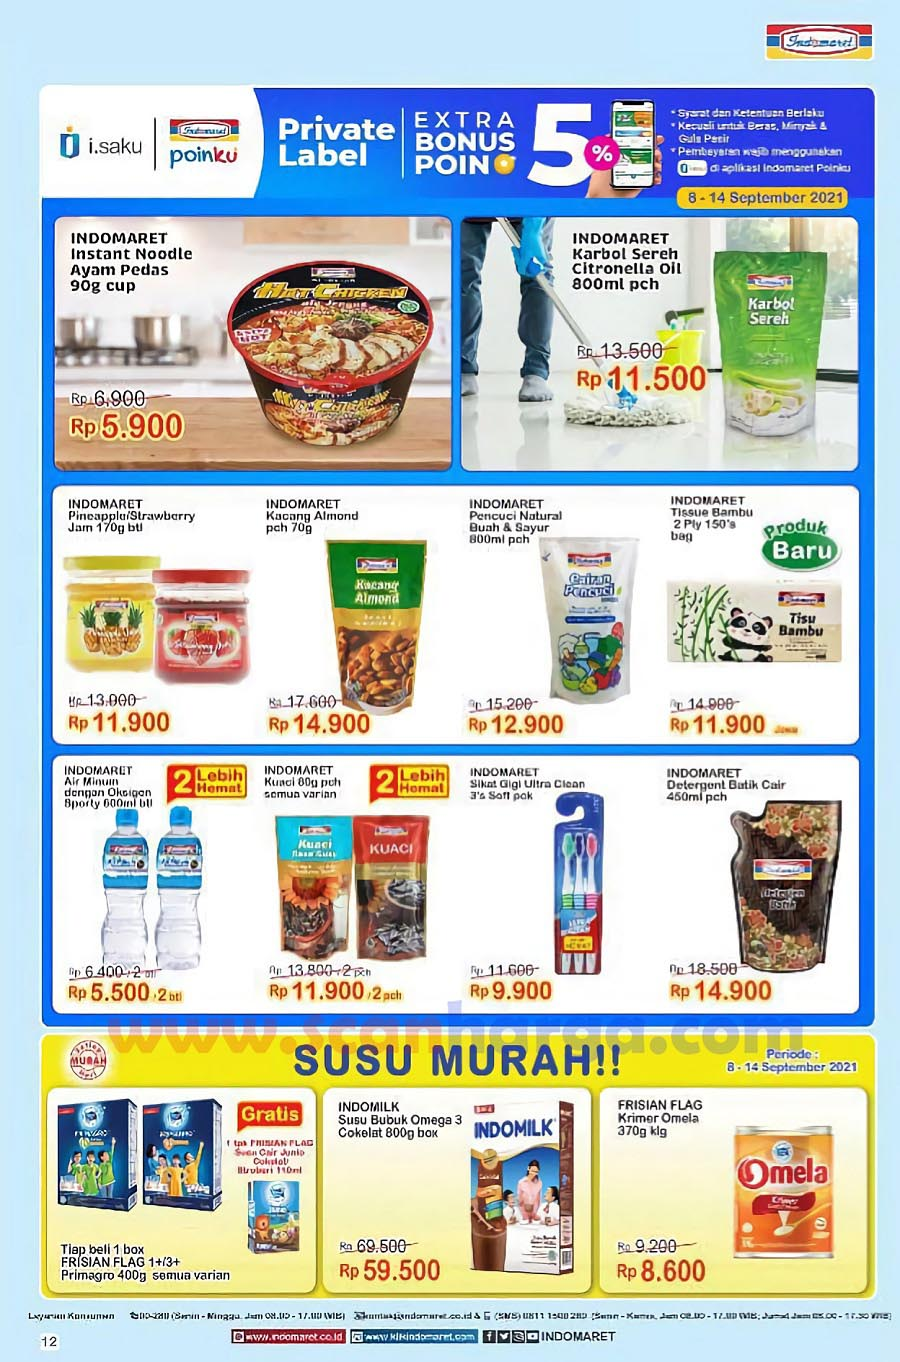 Katalog Indomaret Promo Terbaru 8 - 14 September 2021 12